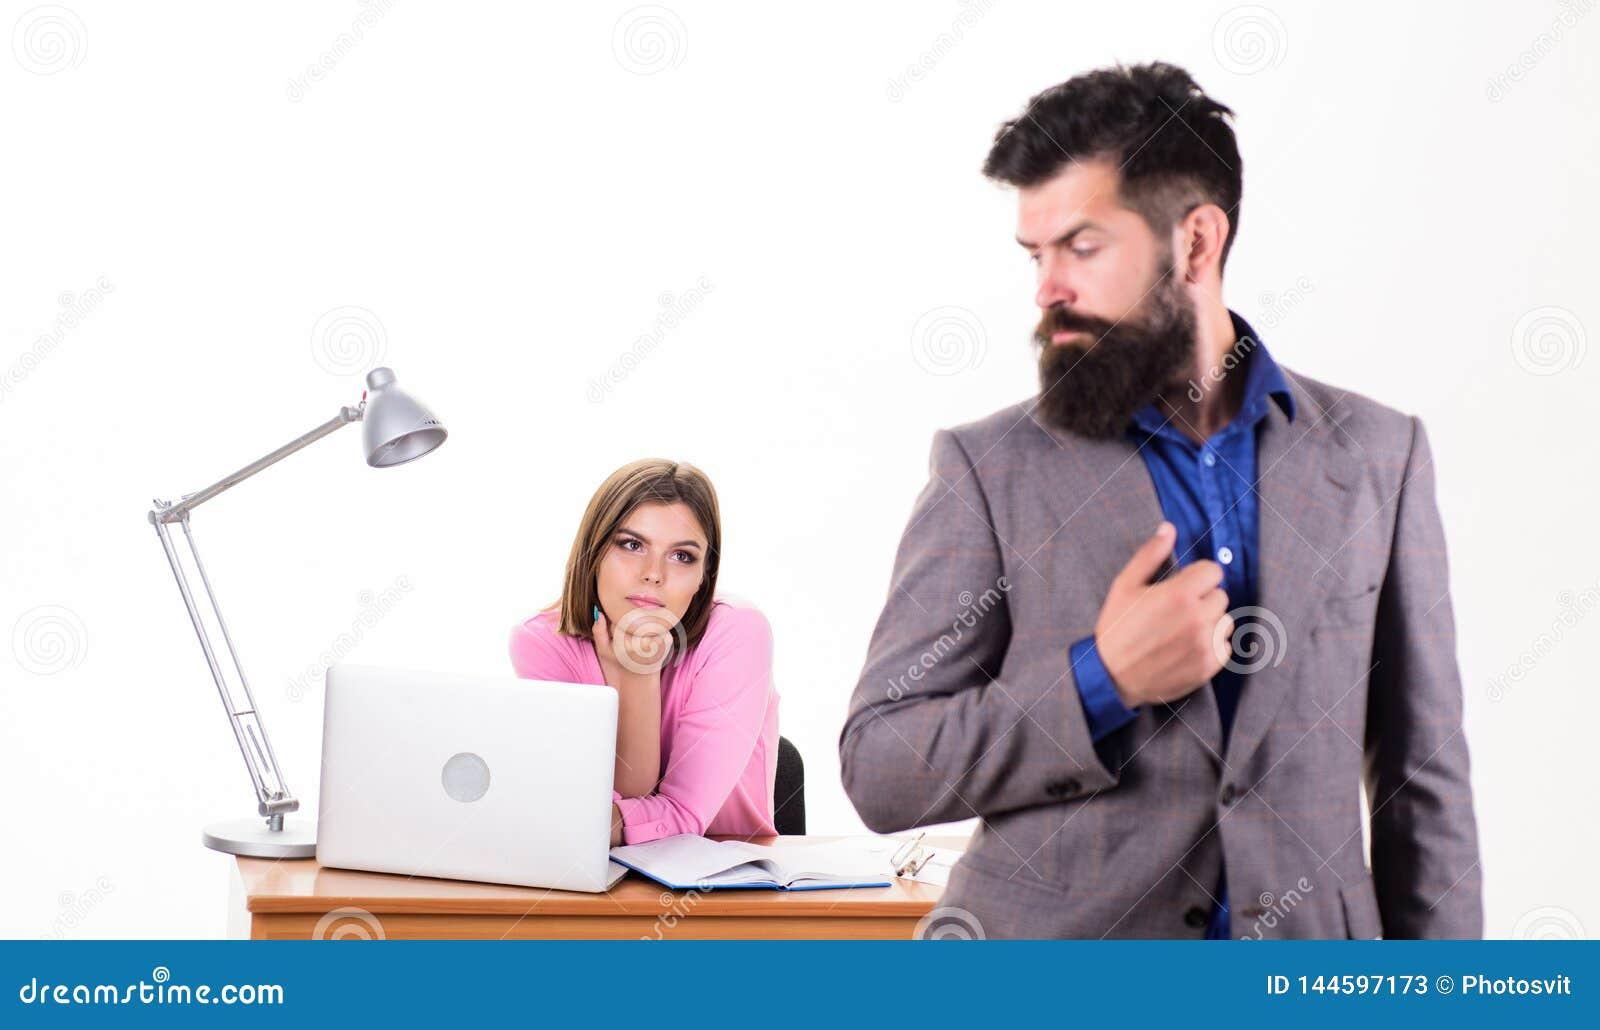 sexy women looking for men